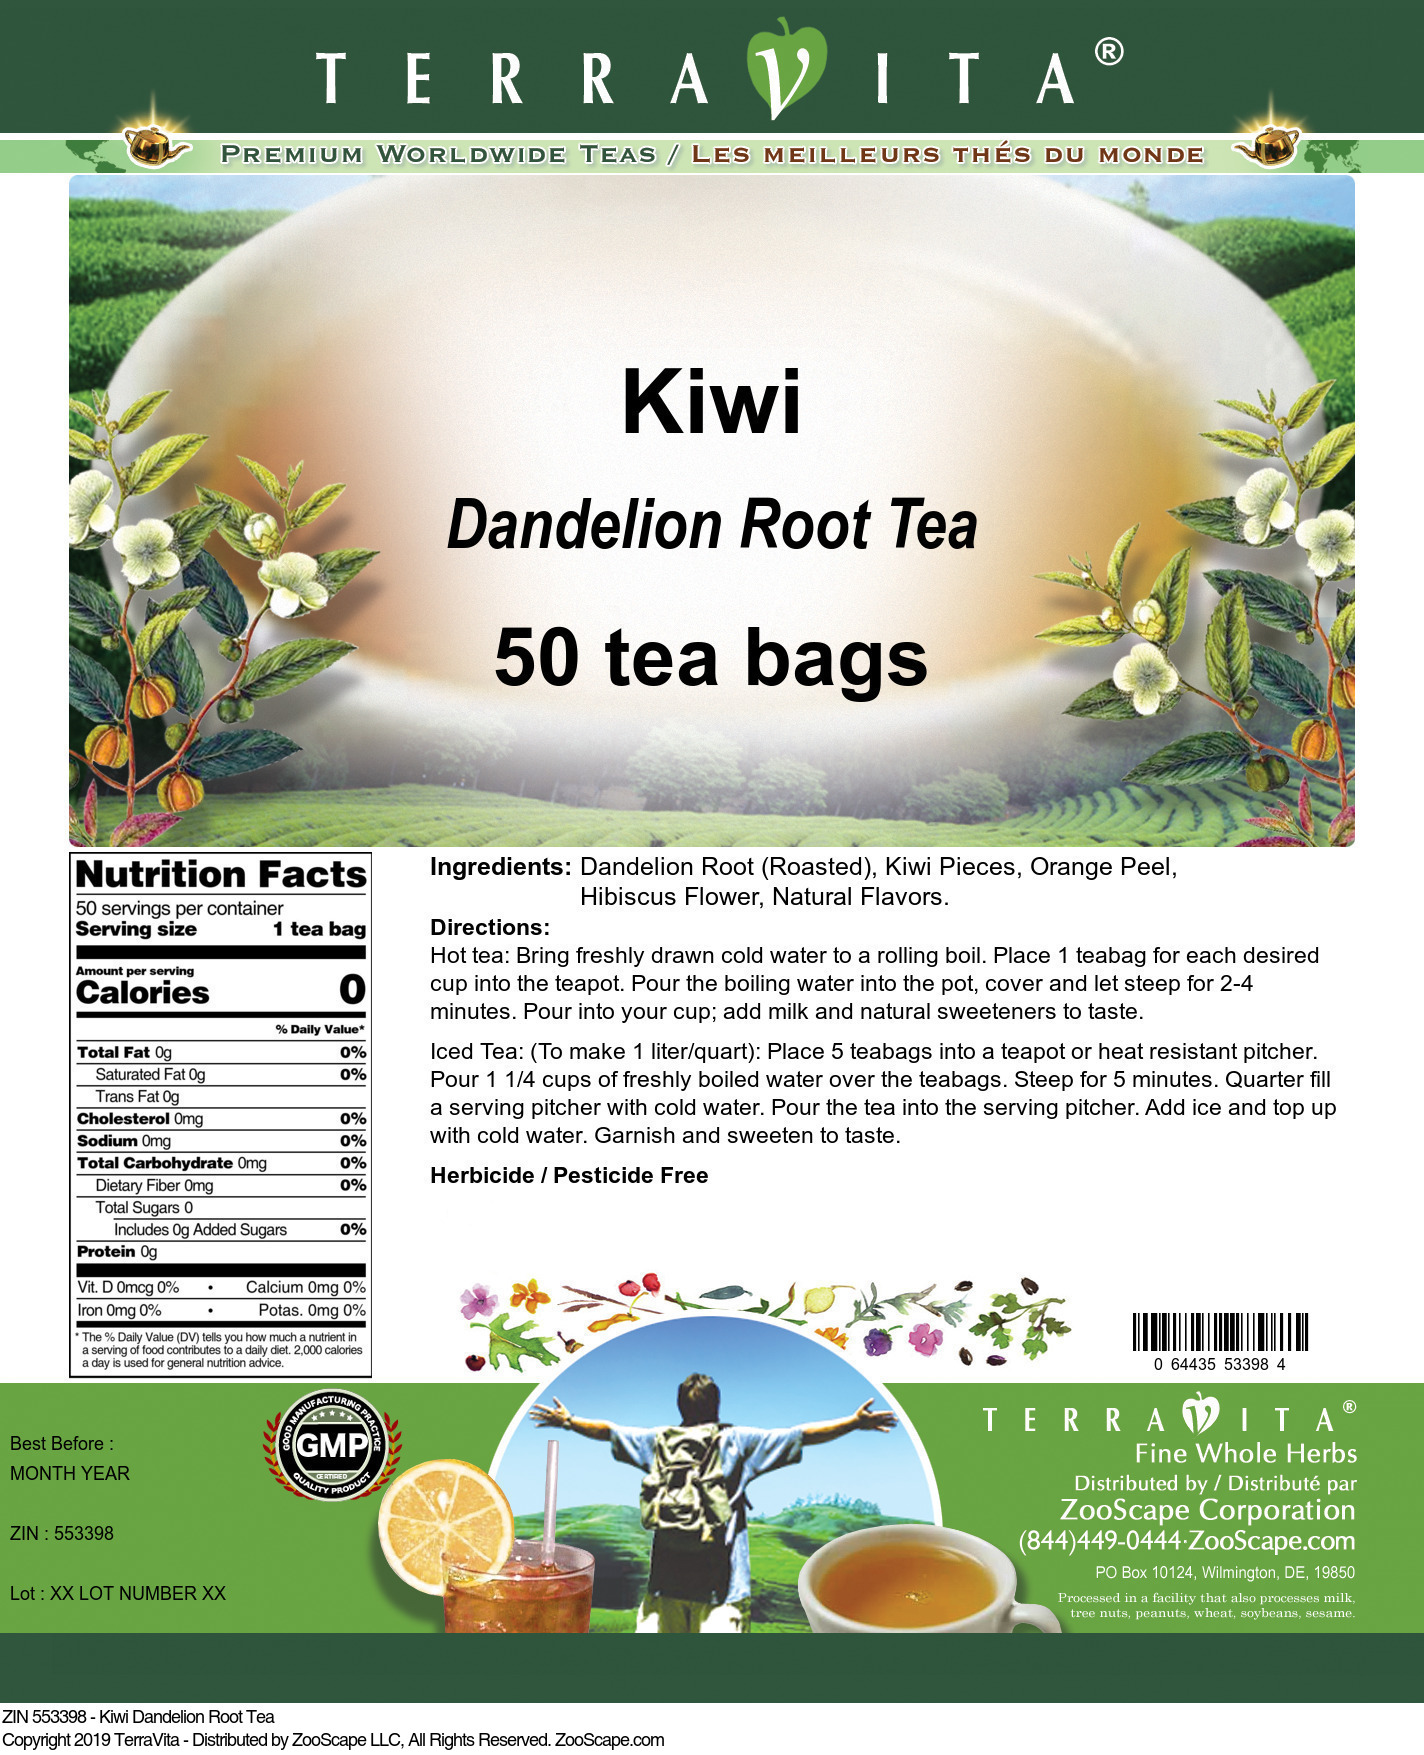 Kiwi Dandelion Root Tea